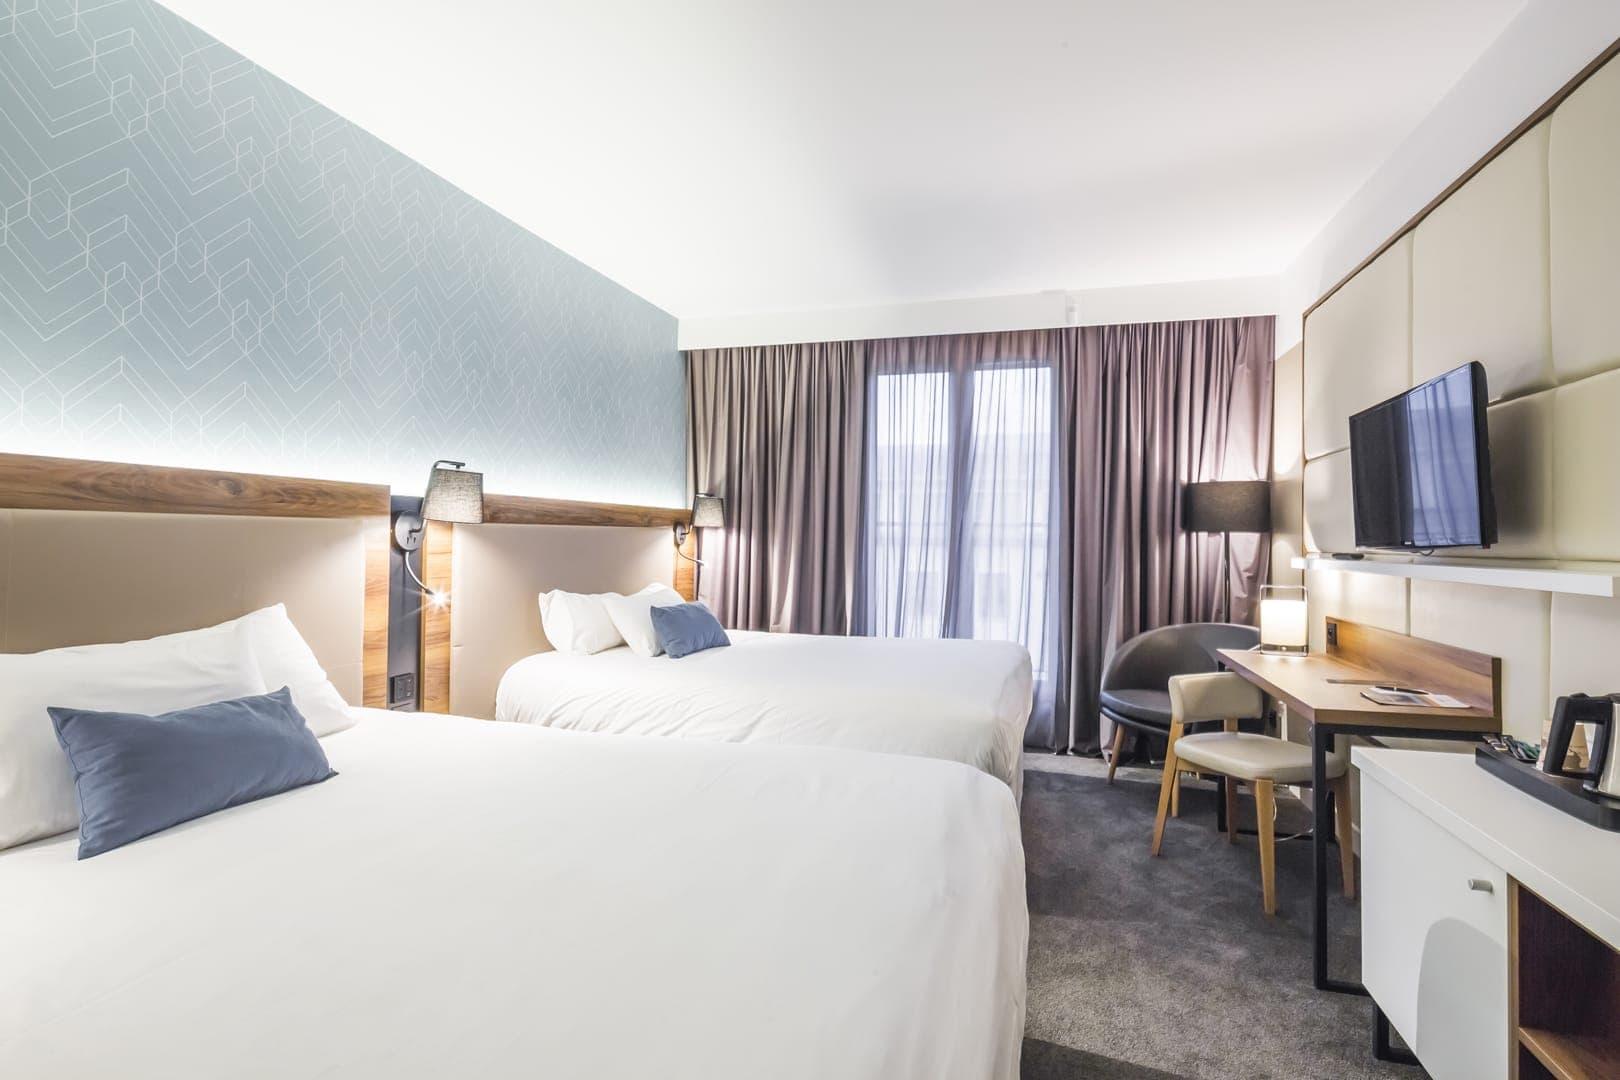 Hotel Elysee Val d\'Europe | Boutique Hotel near Disneyland Paris